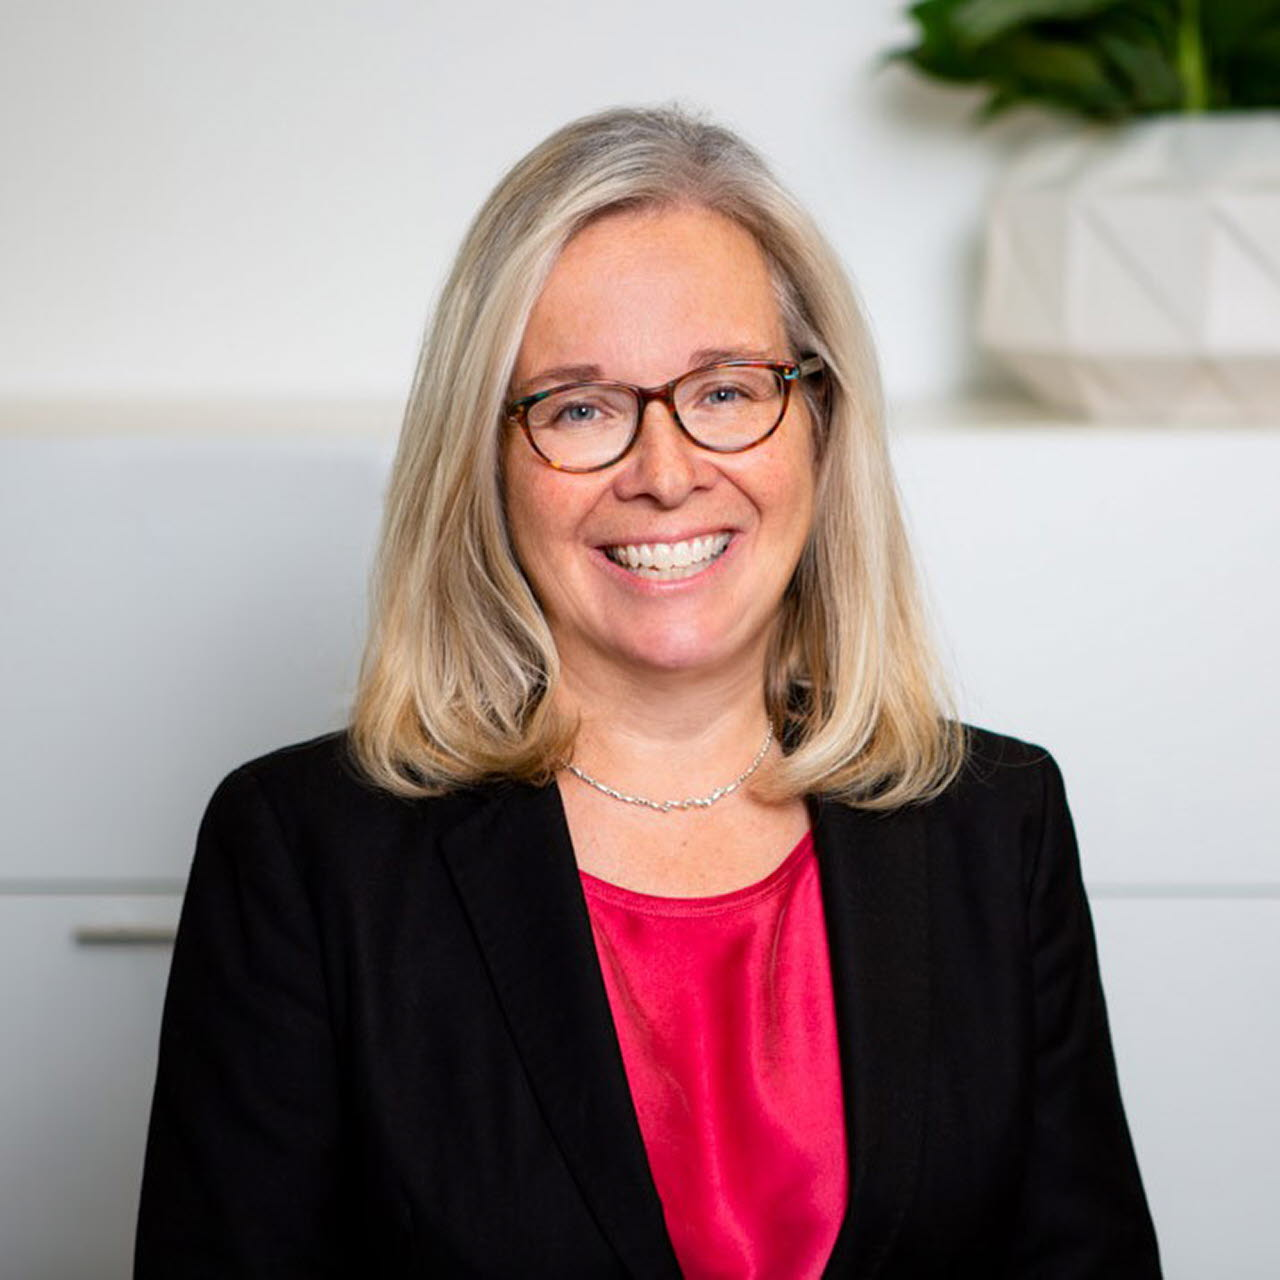 Sharon C. Vogel